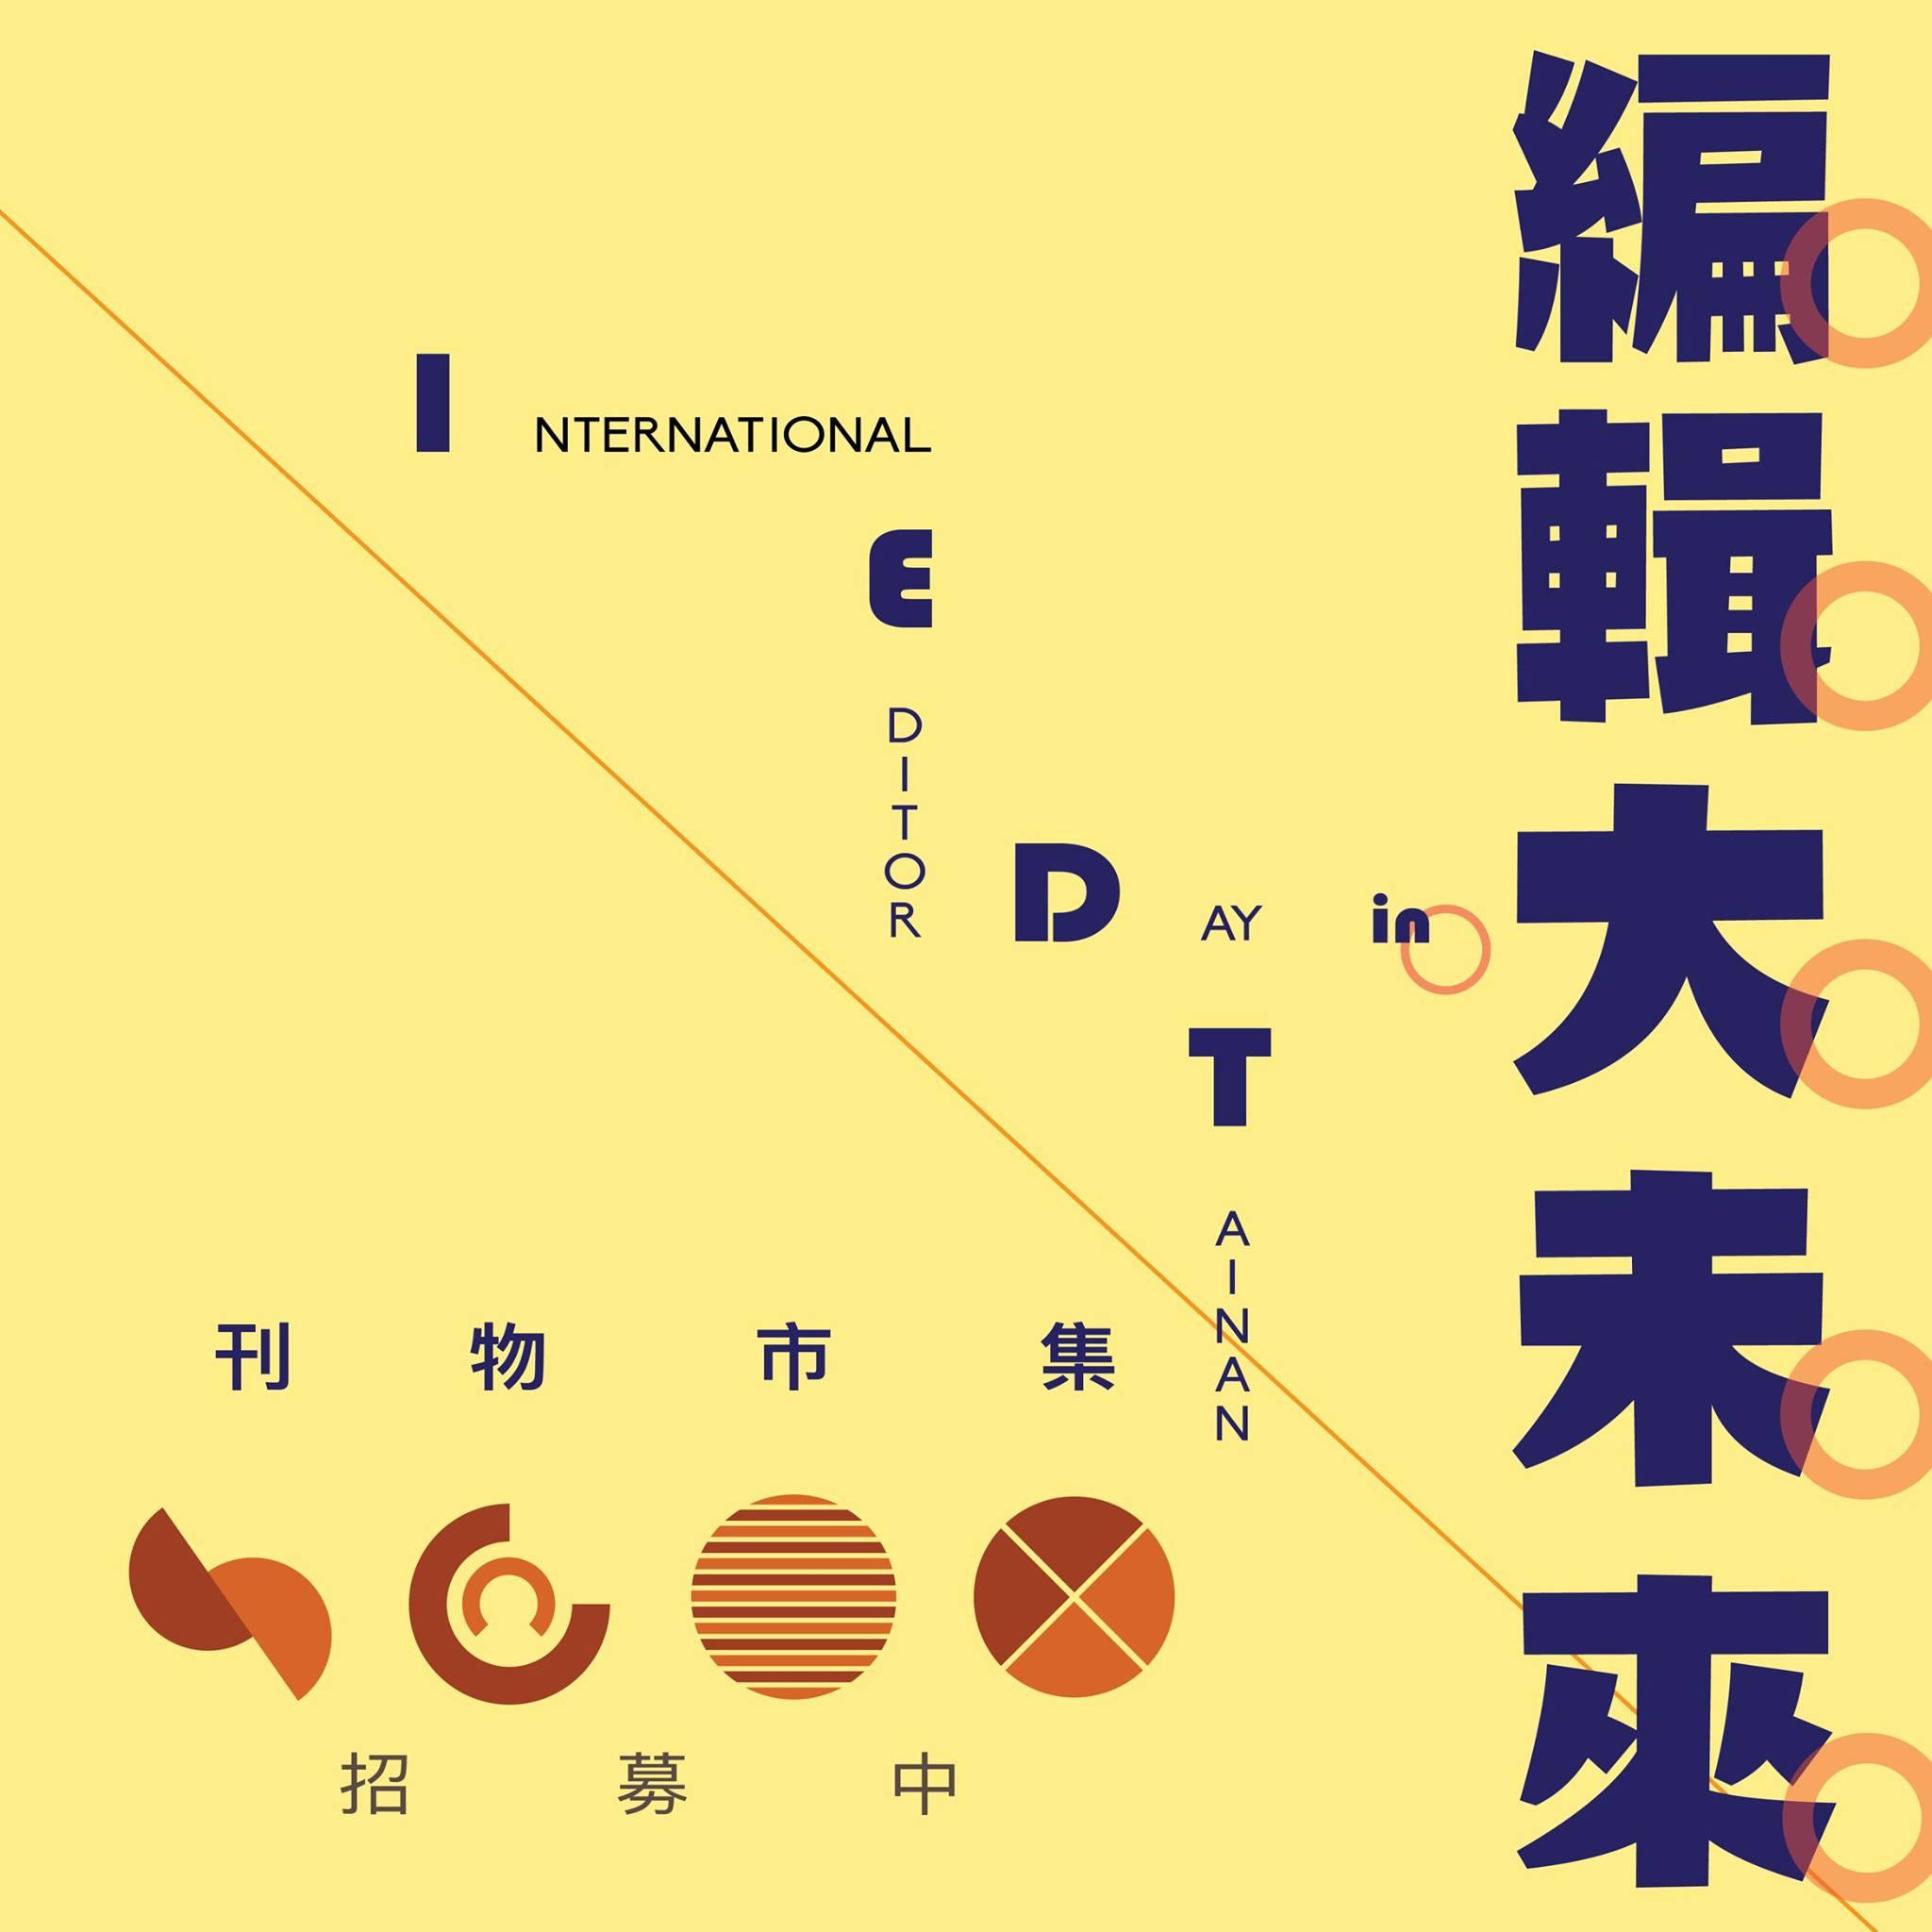 IEDT國際編輯人聚會在台南 在這裡說出最真實的聲音